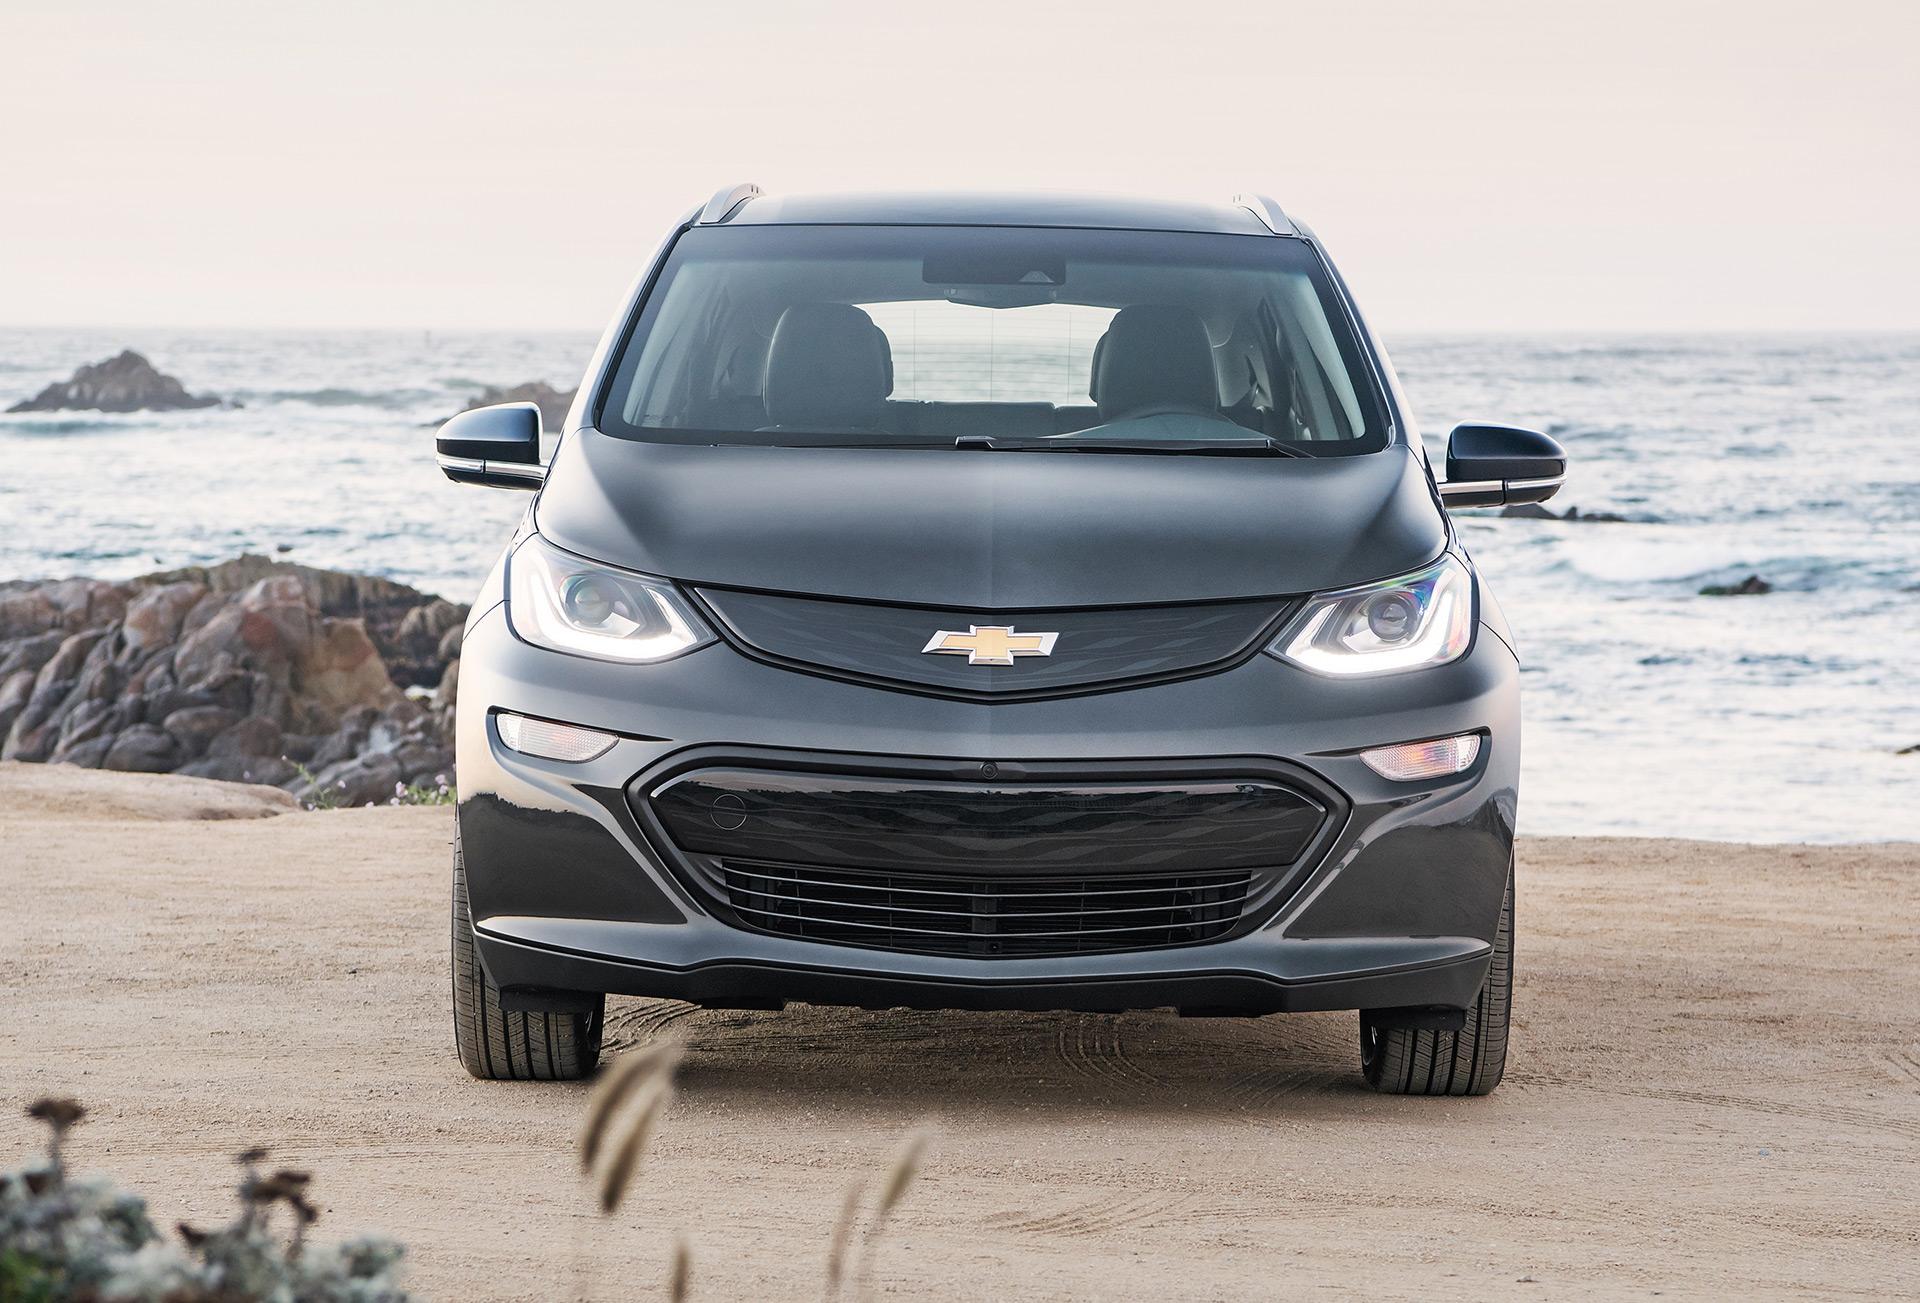 best deals on hybrid electric fuel efficient cars for january 2018. Black Bedroom Furniture Sets. Home Design Ideas